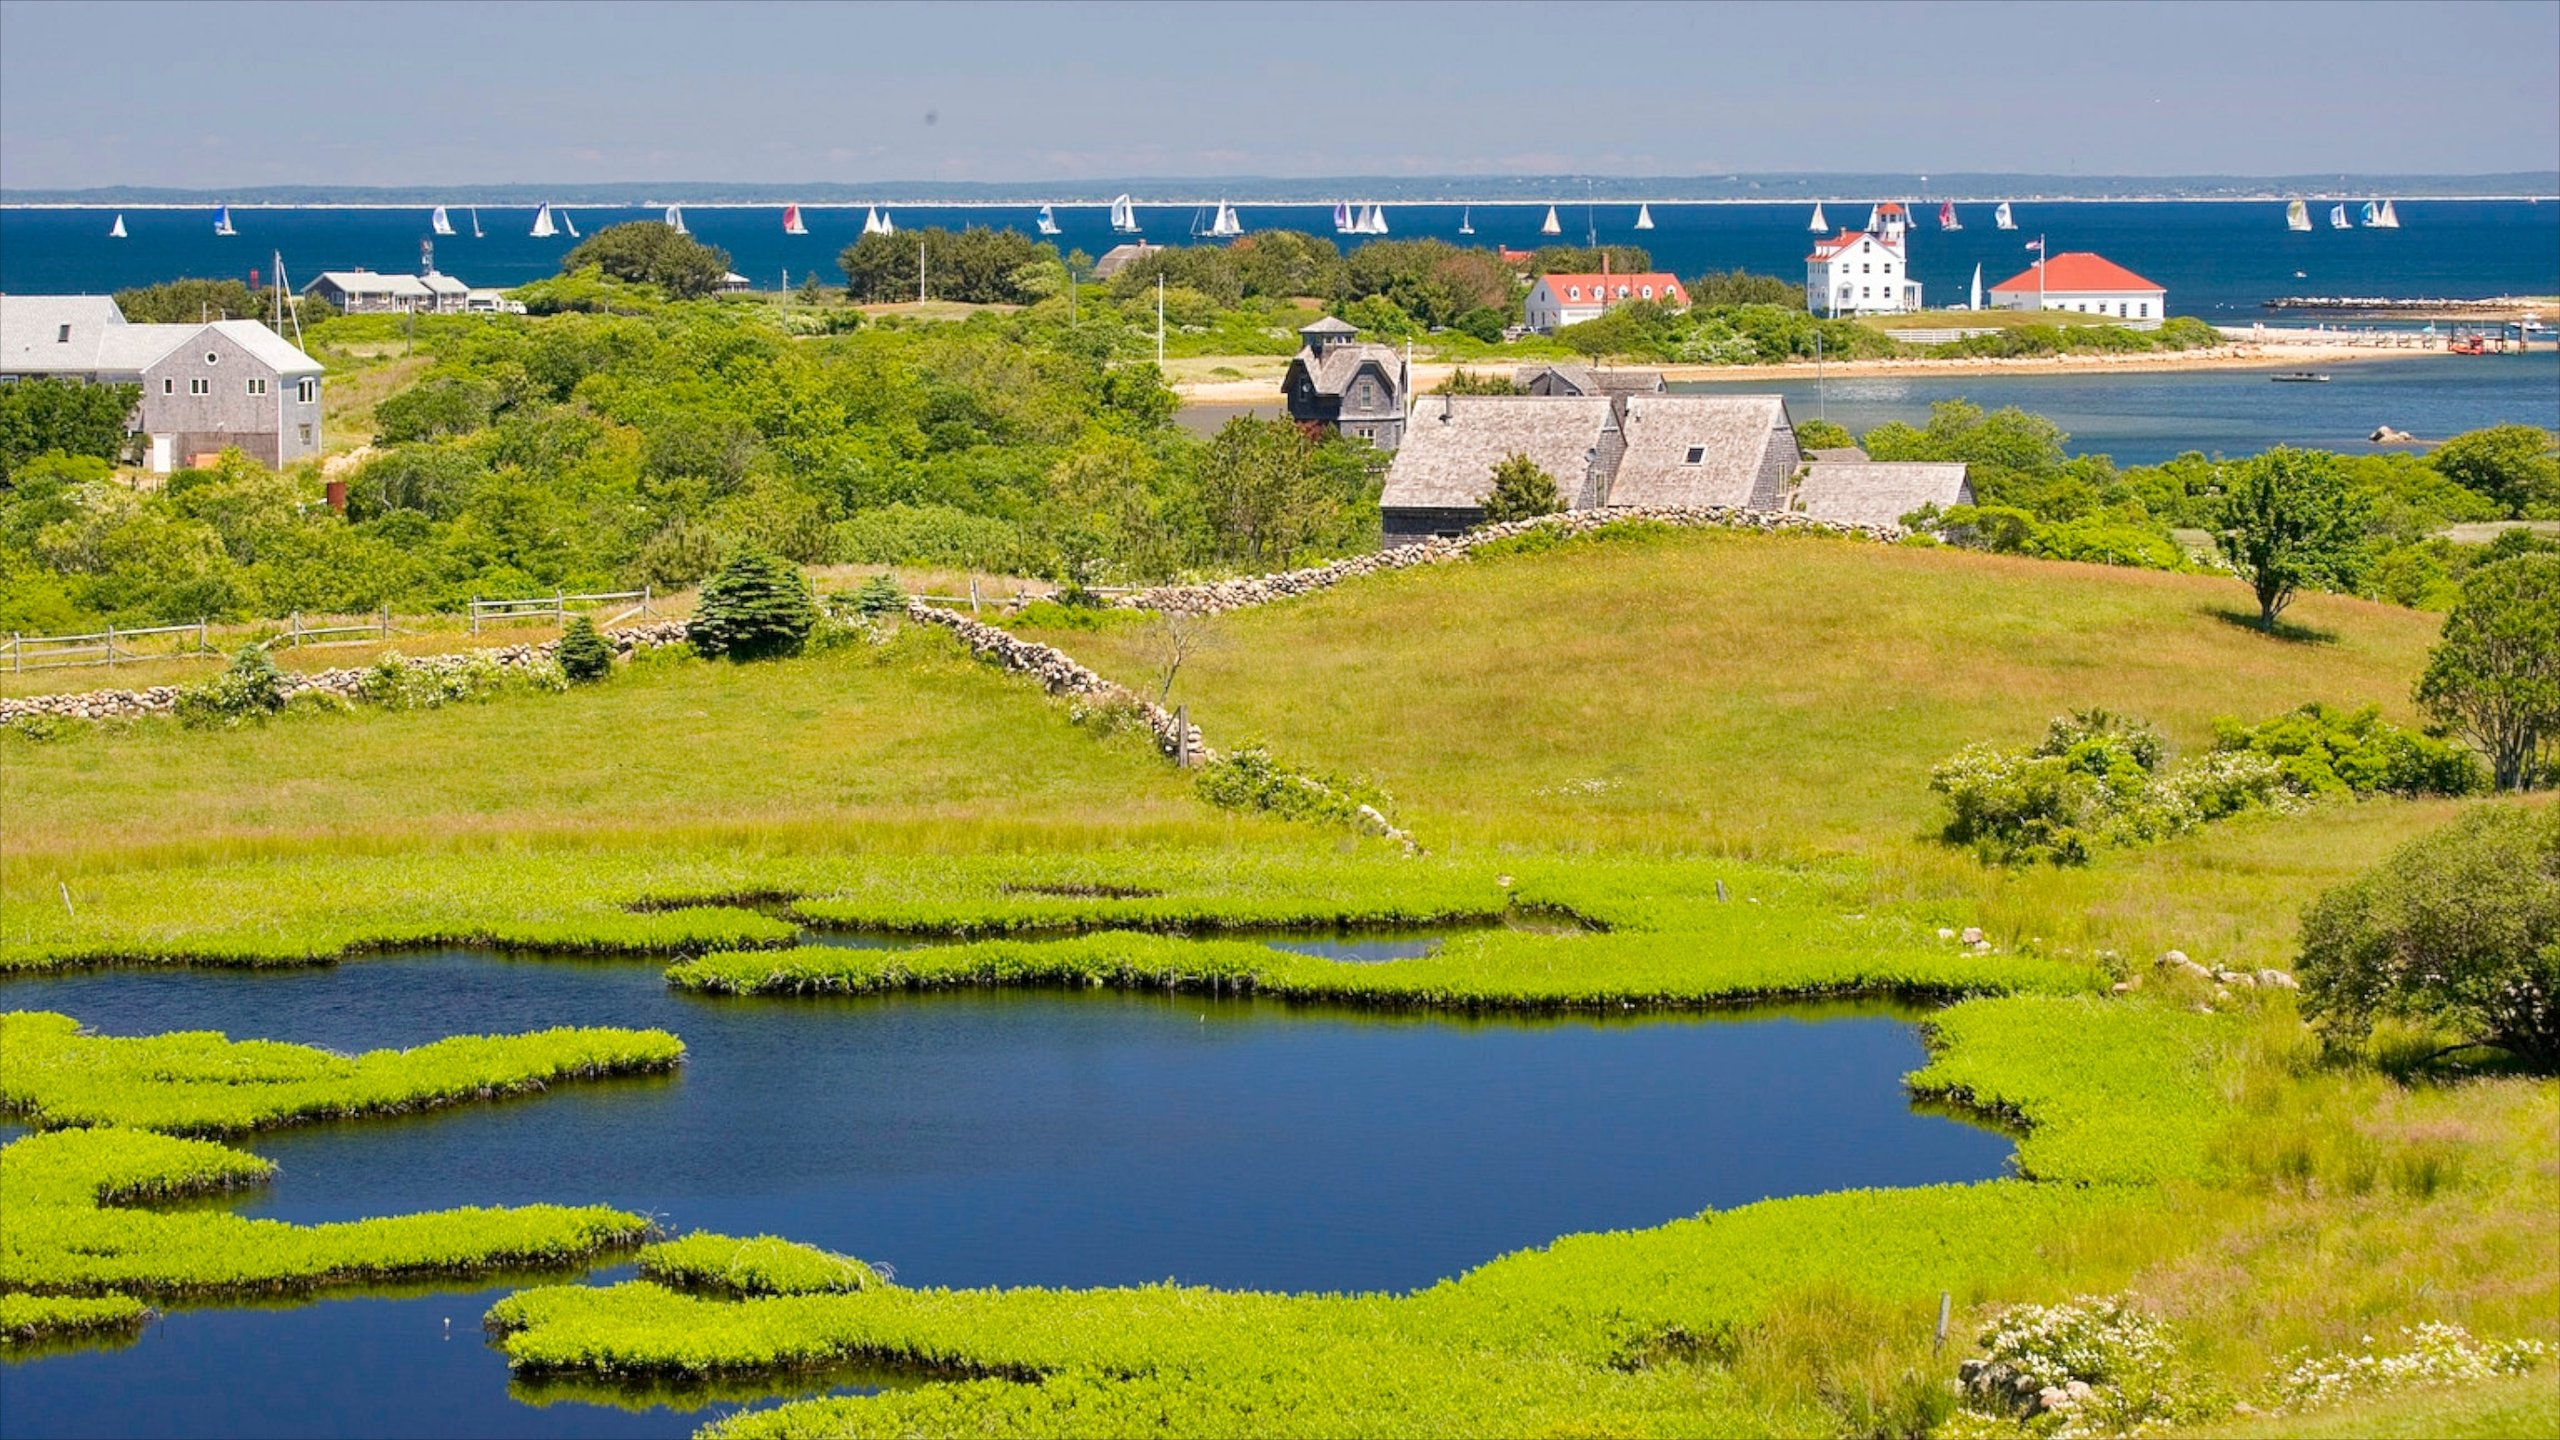 New Shoreham, Rhode Island, United States of America